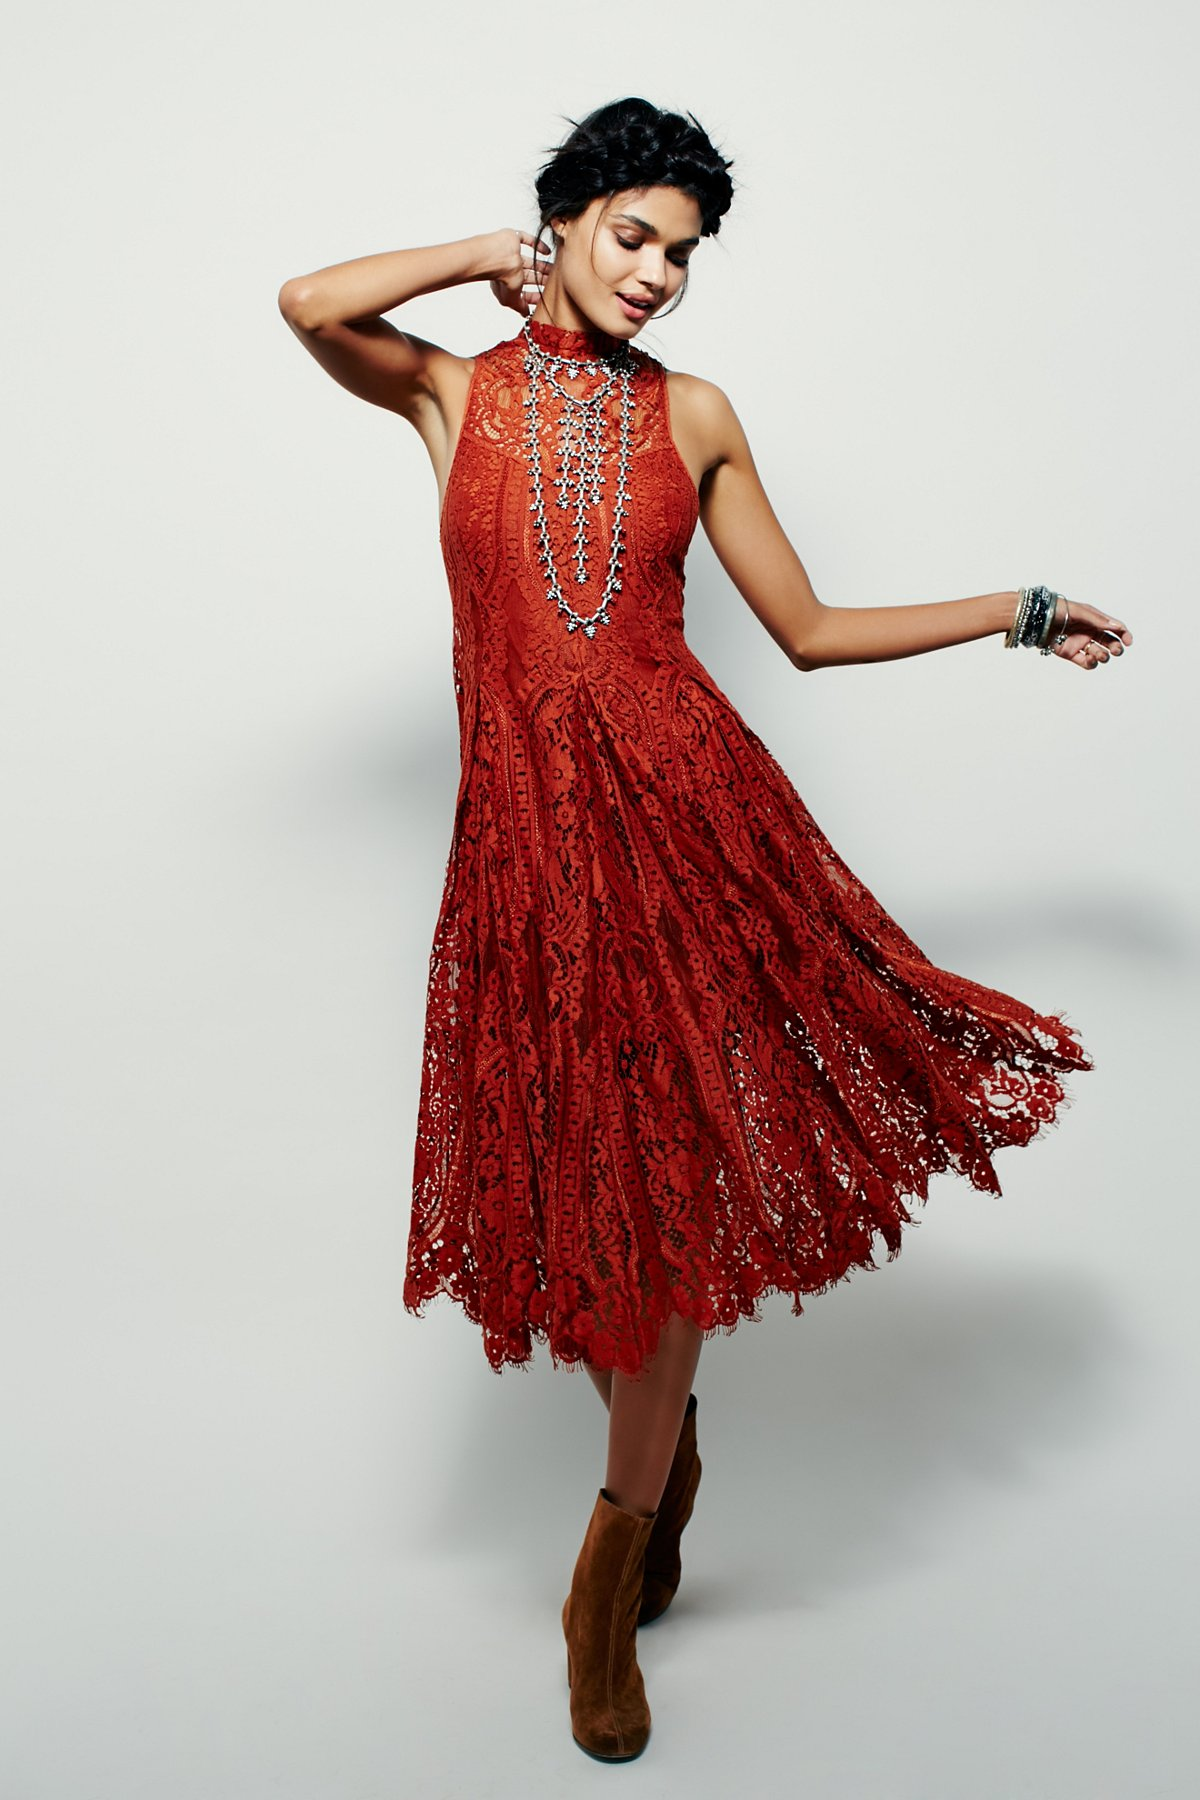 Angel Rays Dress